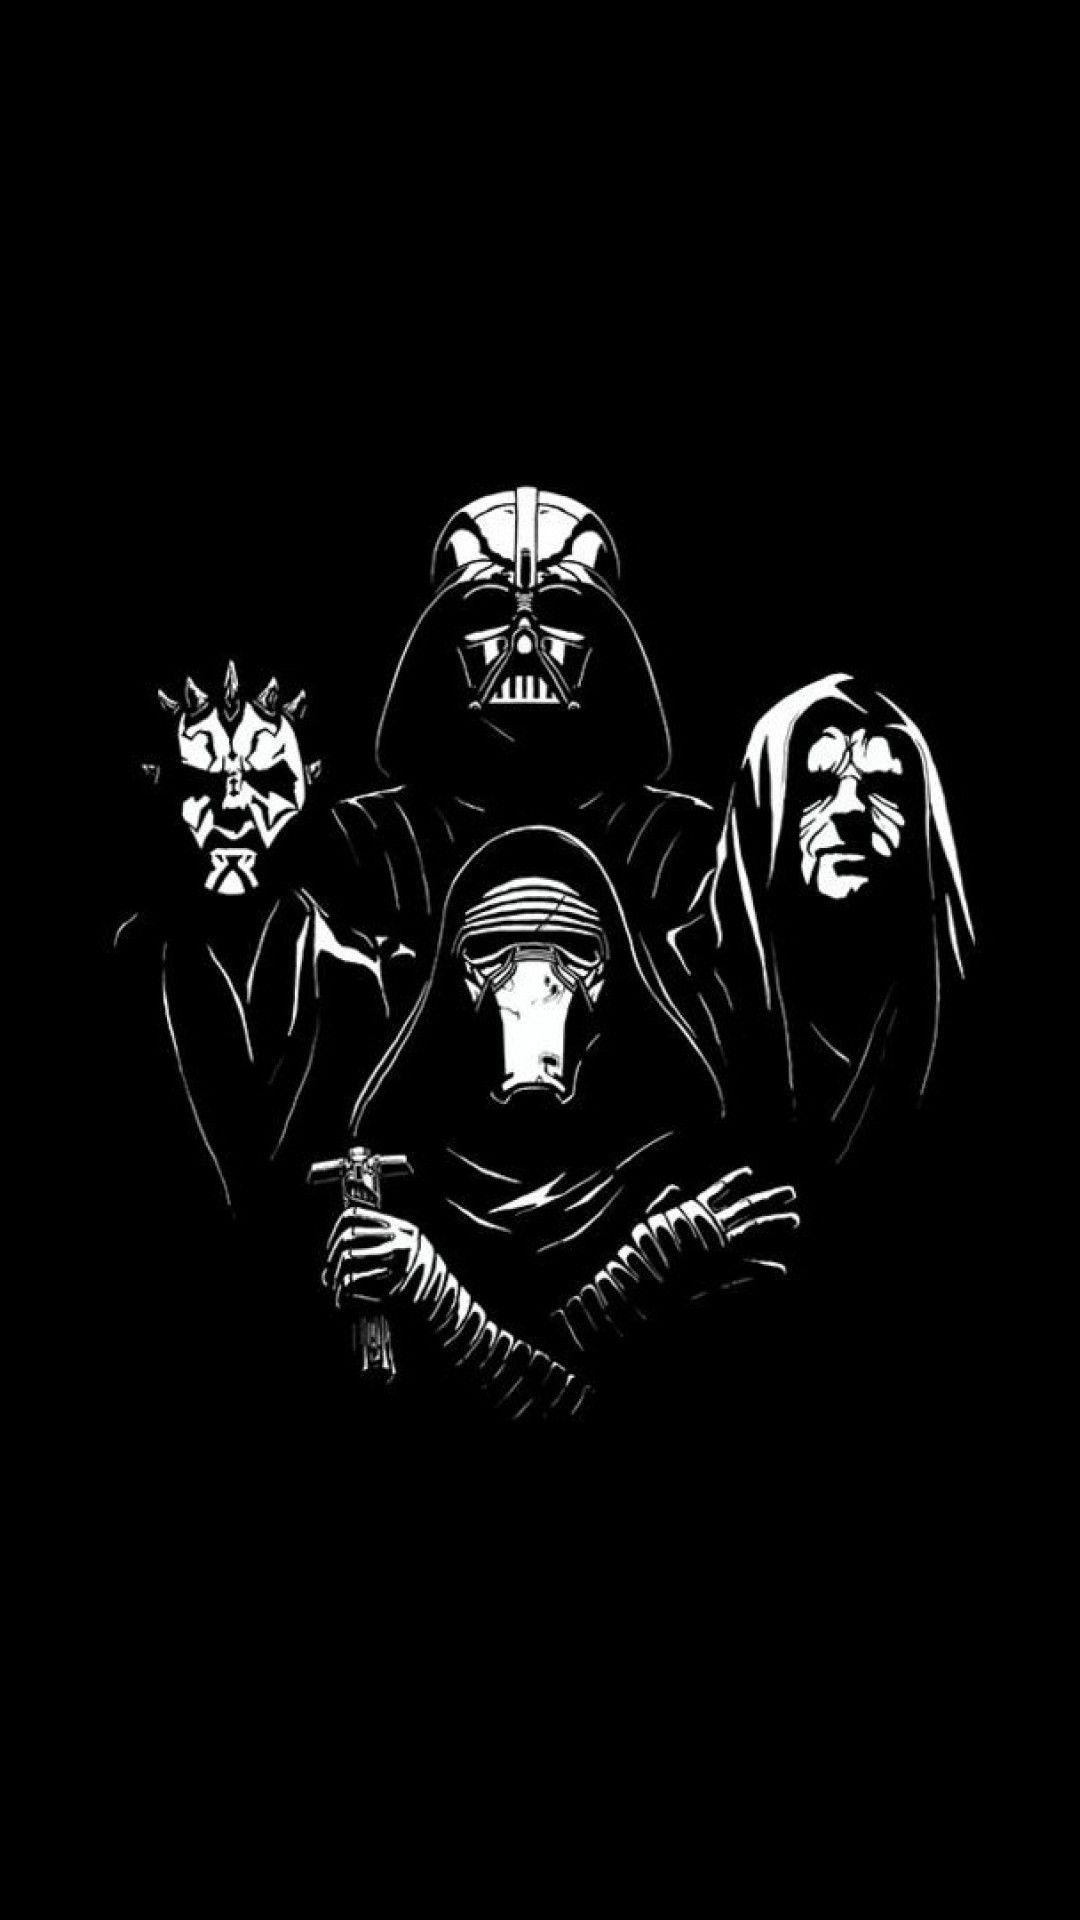 Darth Vader Star Wars Wallpaper Iphone In 2020 Star Wars Wallpaper Iphone Star Wars Wallpaper Star Wars Background